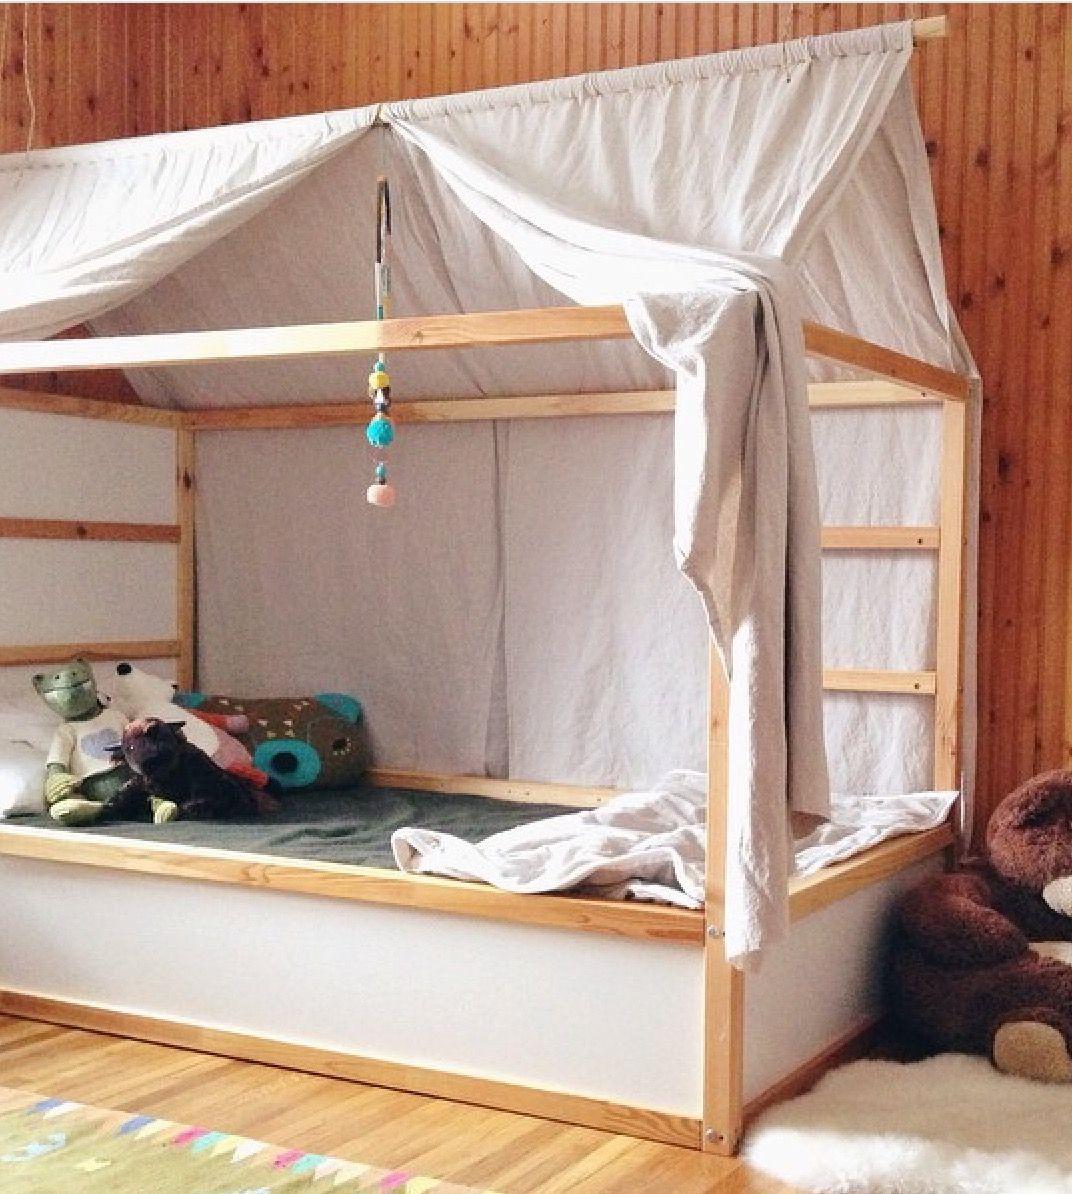 pingl par creature by d pillsbury sur my world for the home pinterest chambre enfant. Black Bedroom Furniture Sets. Home Design Ideas